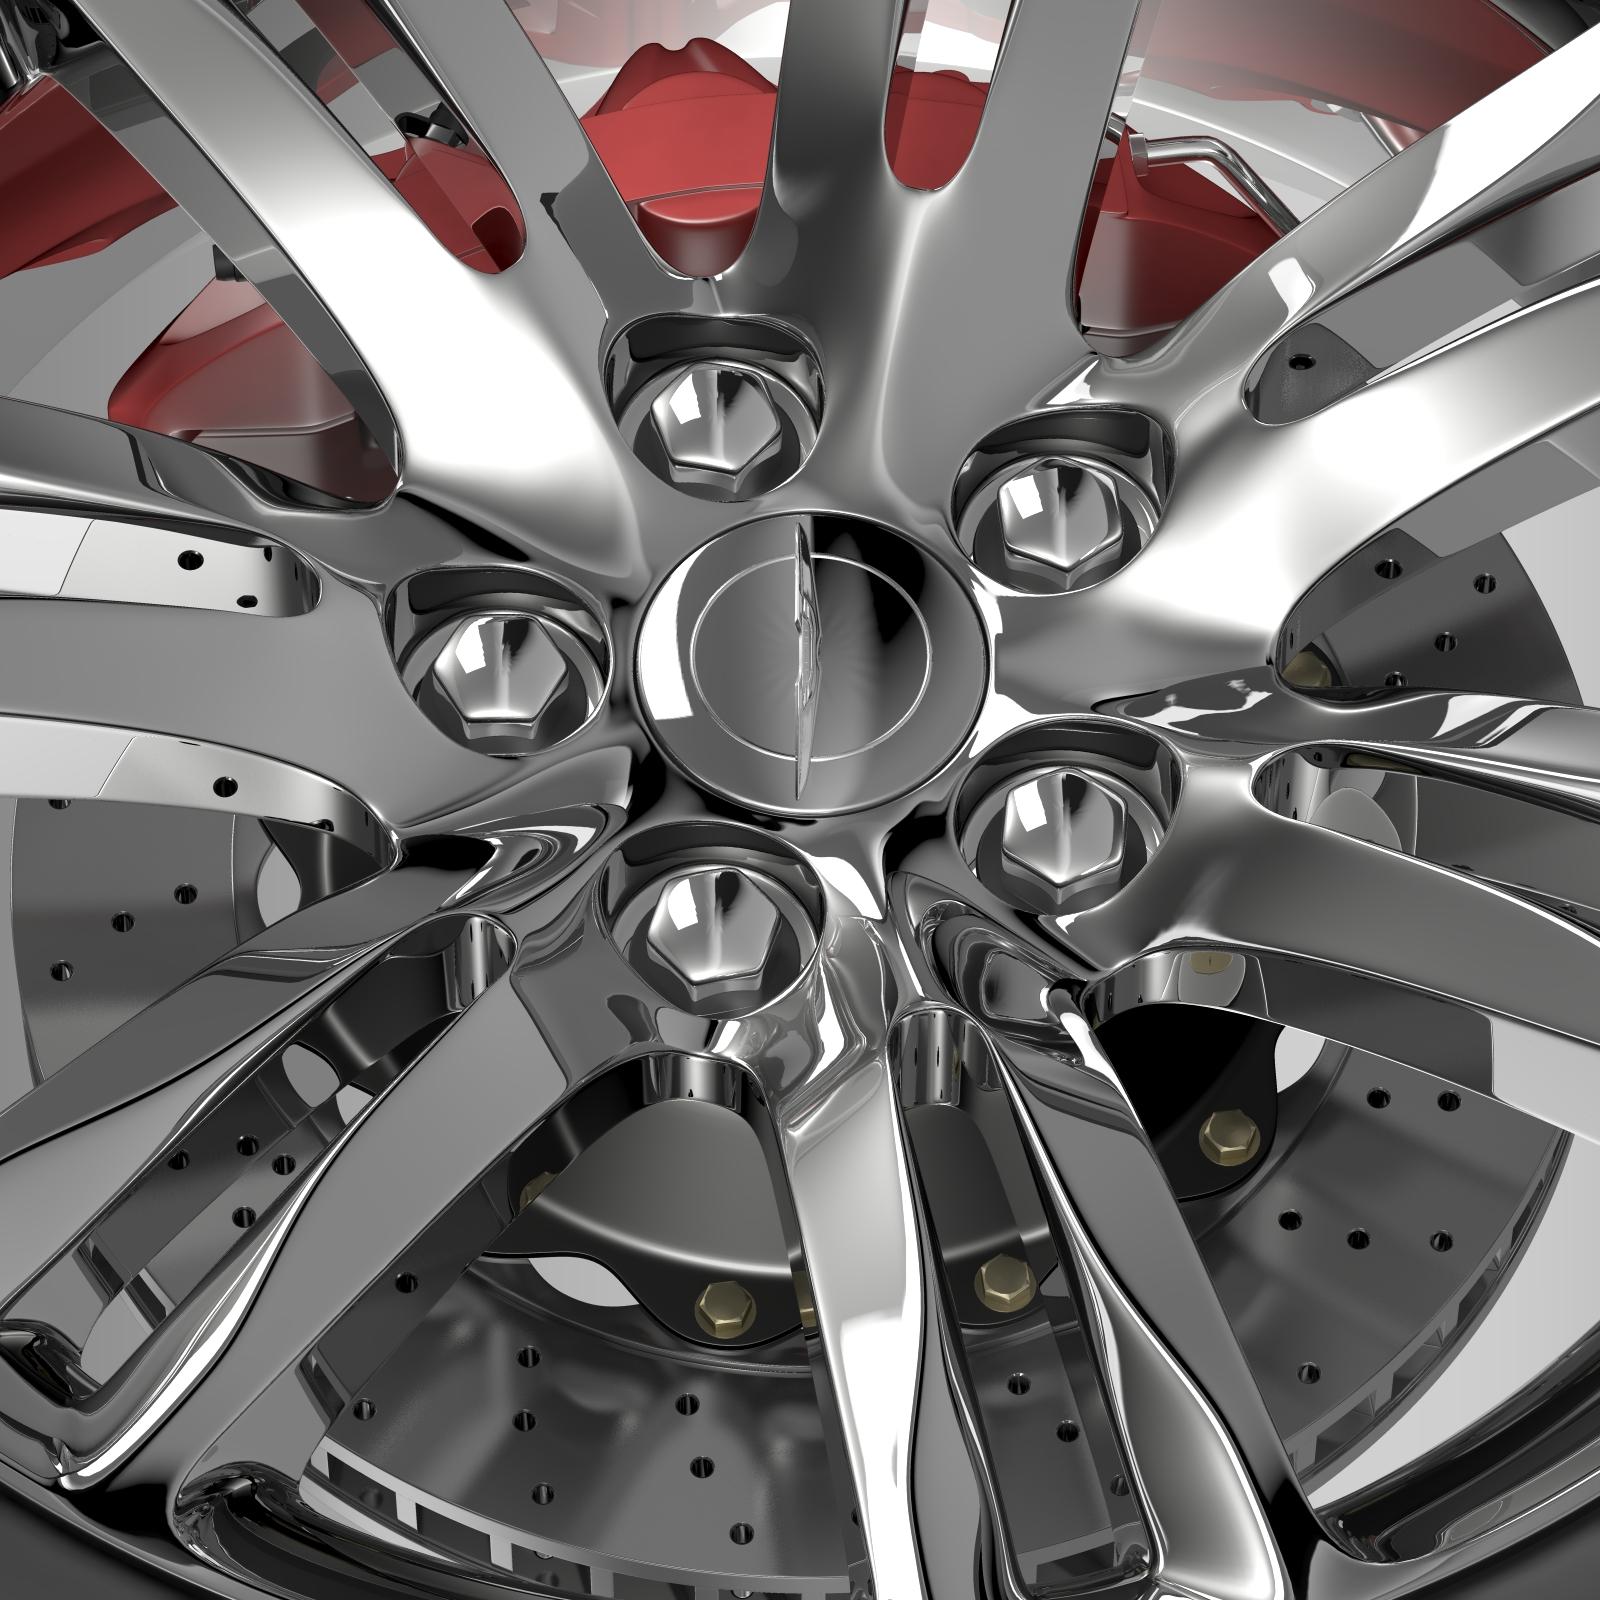 chrysler 300c 2015 wheel 3d model 3ds max fbx c4d lwo ma mb hrc xsi obj 212765